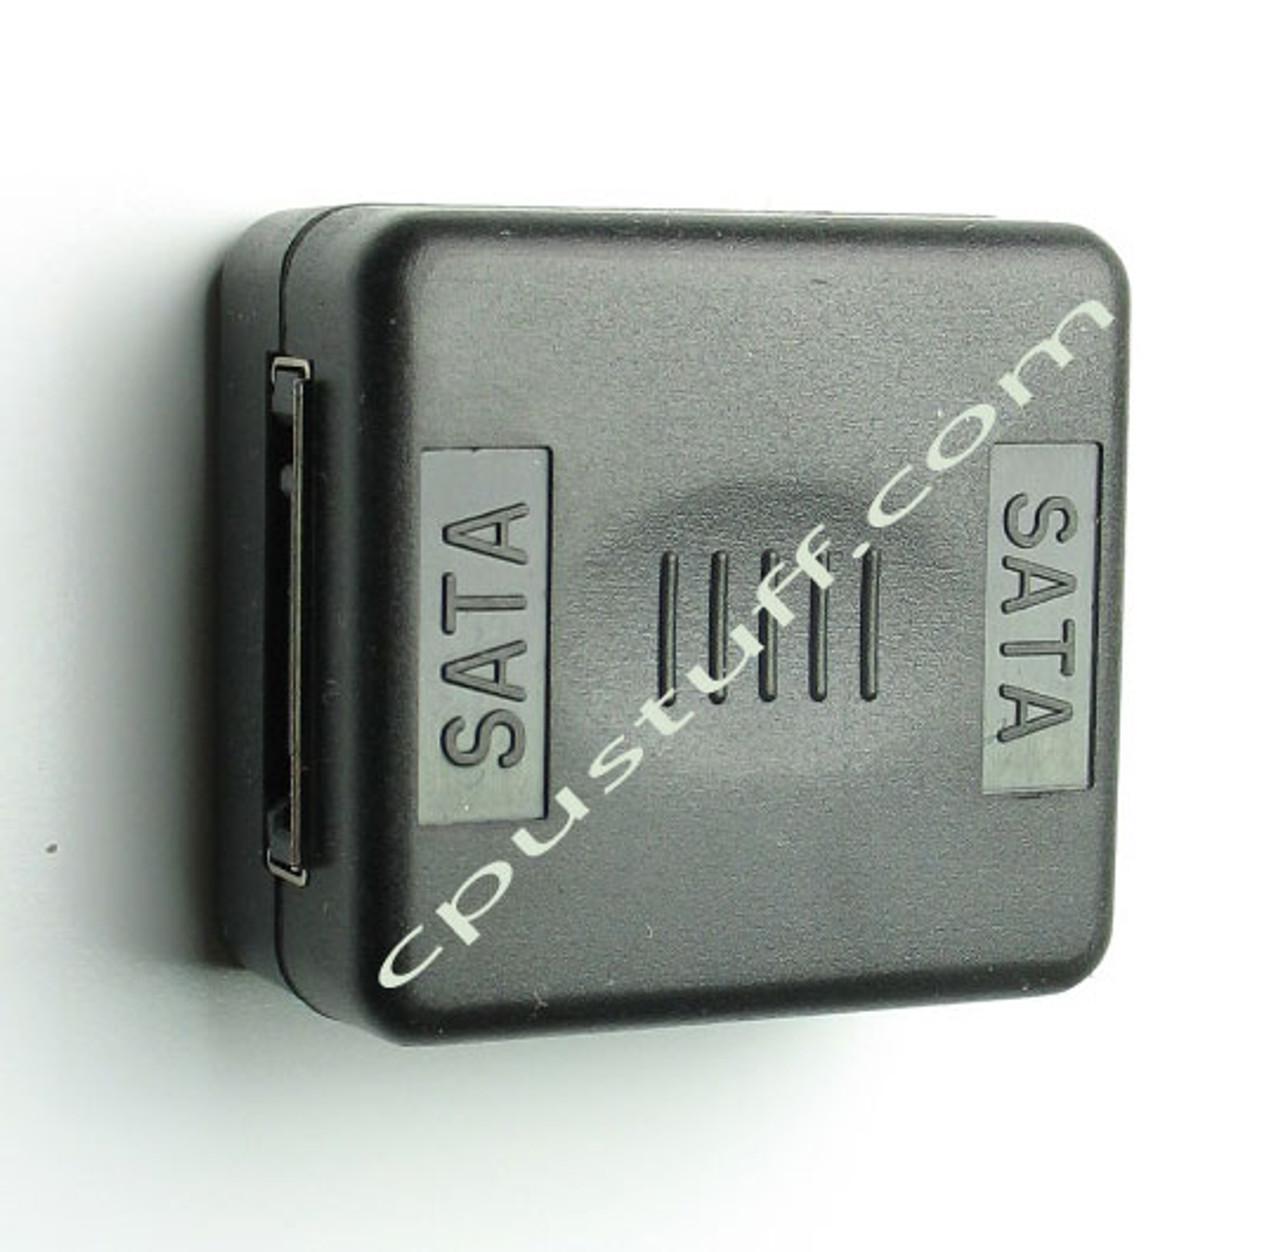 7 Pin Sata Male Adapter